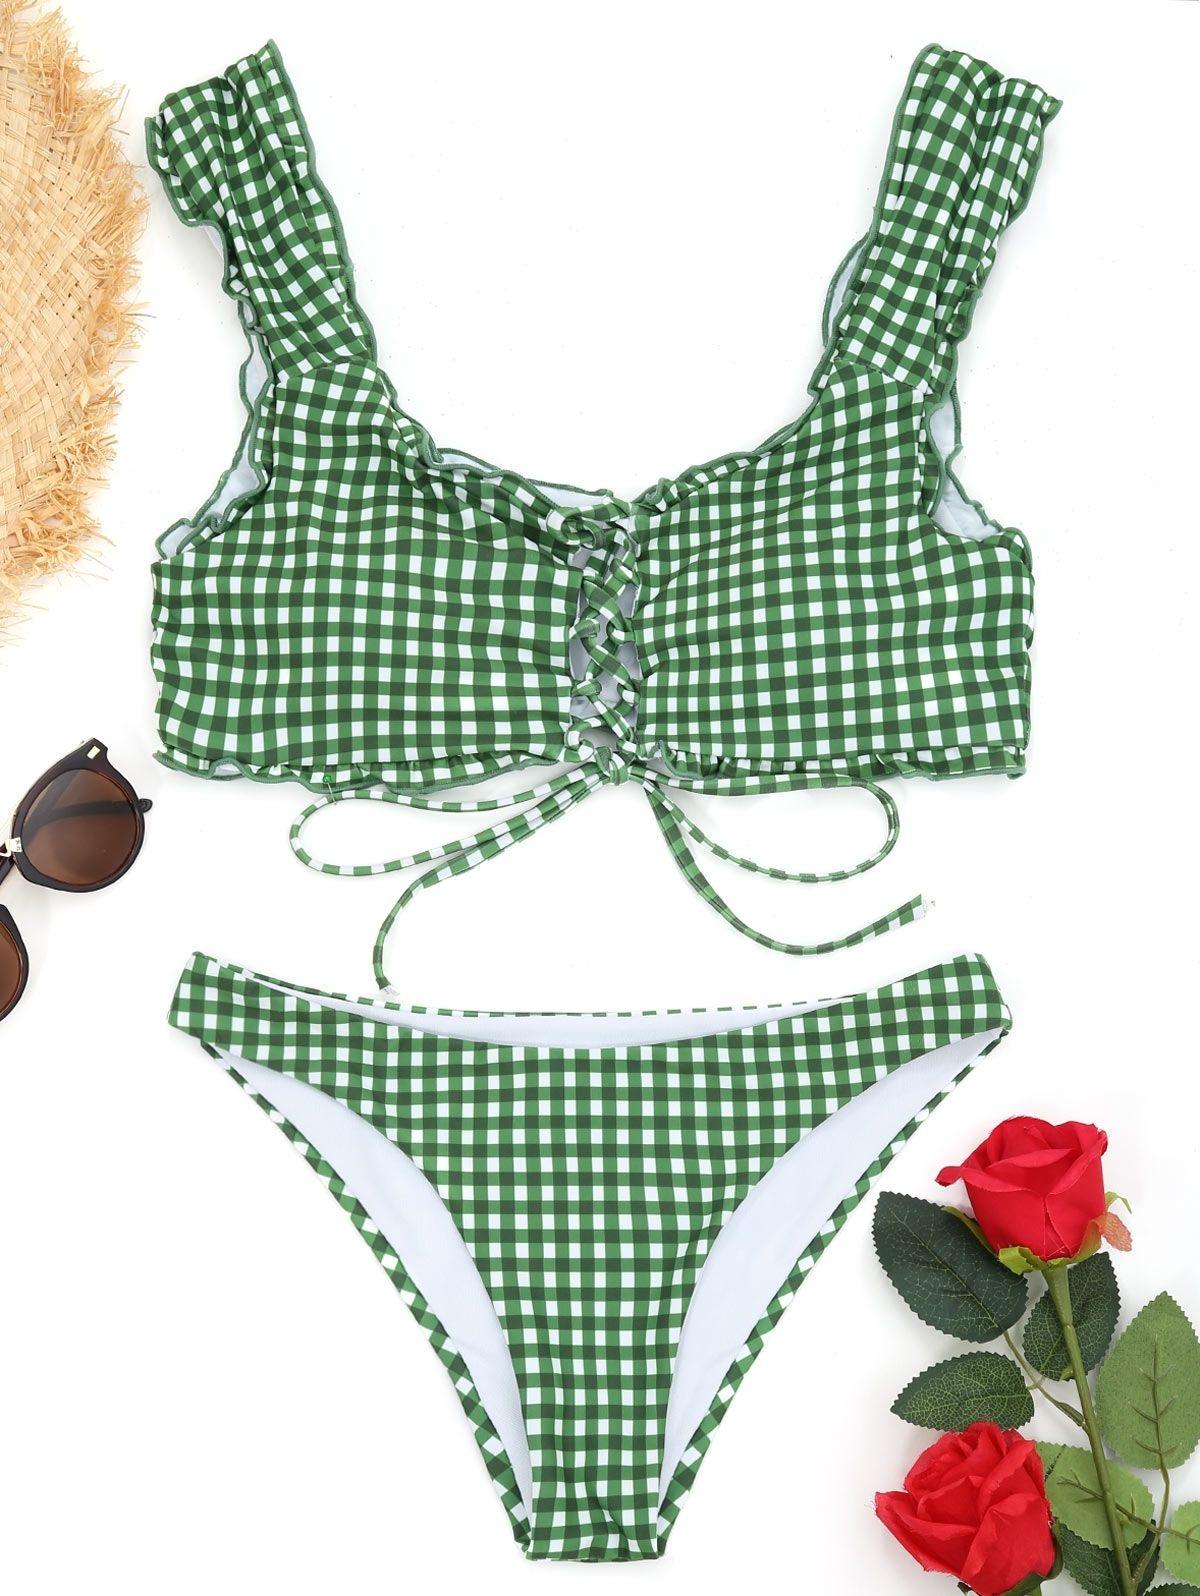 a6a05726a49fe Zaful Frilled Gingham Lace Up Bralette Bikini Set - WHITE AND GREEN ...